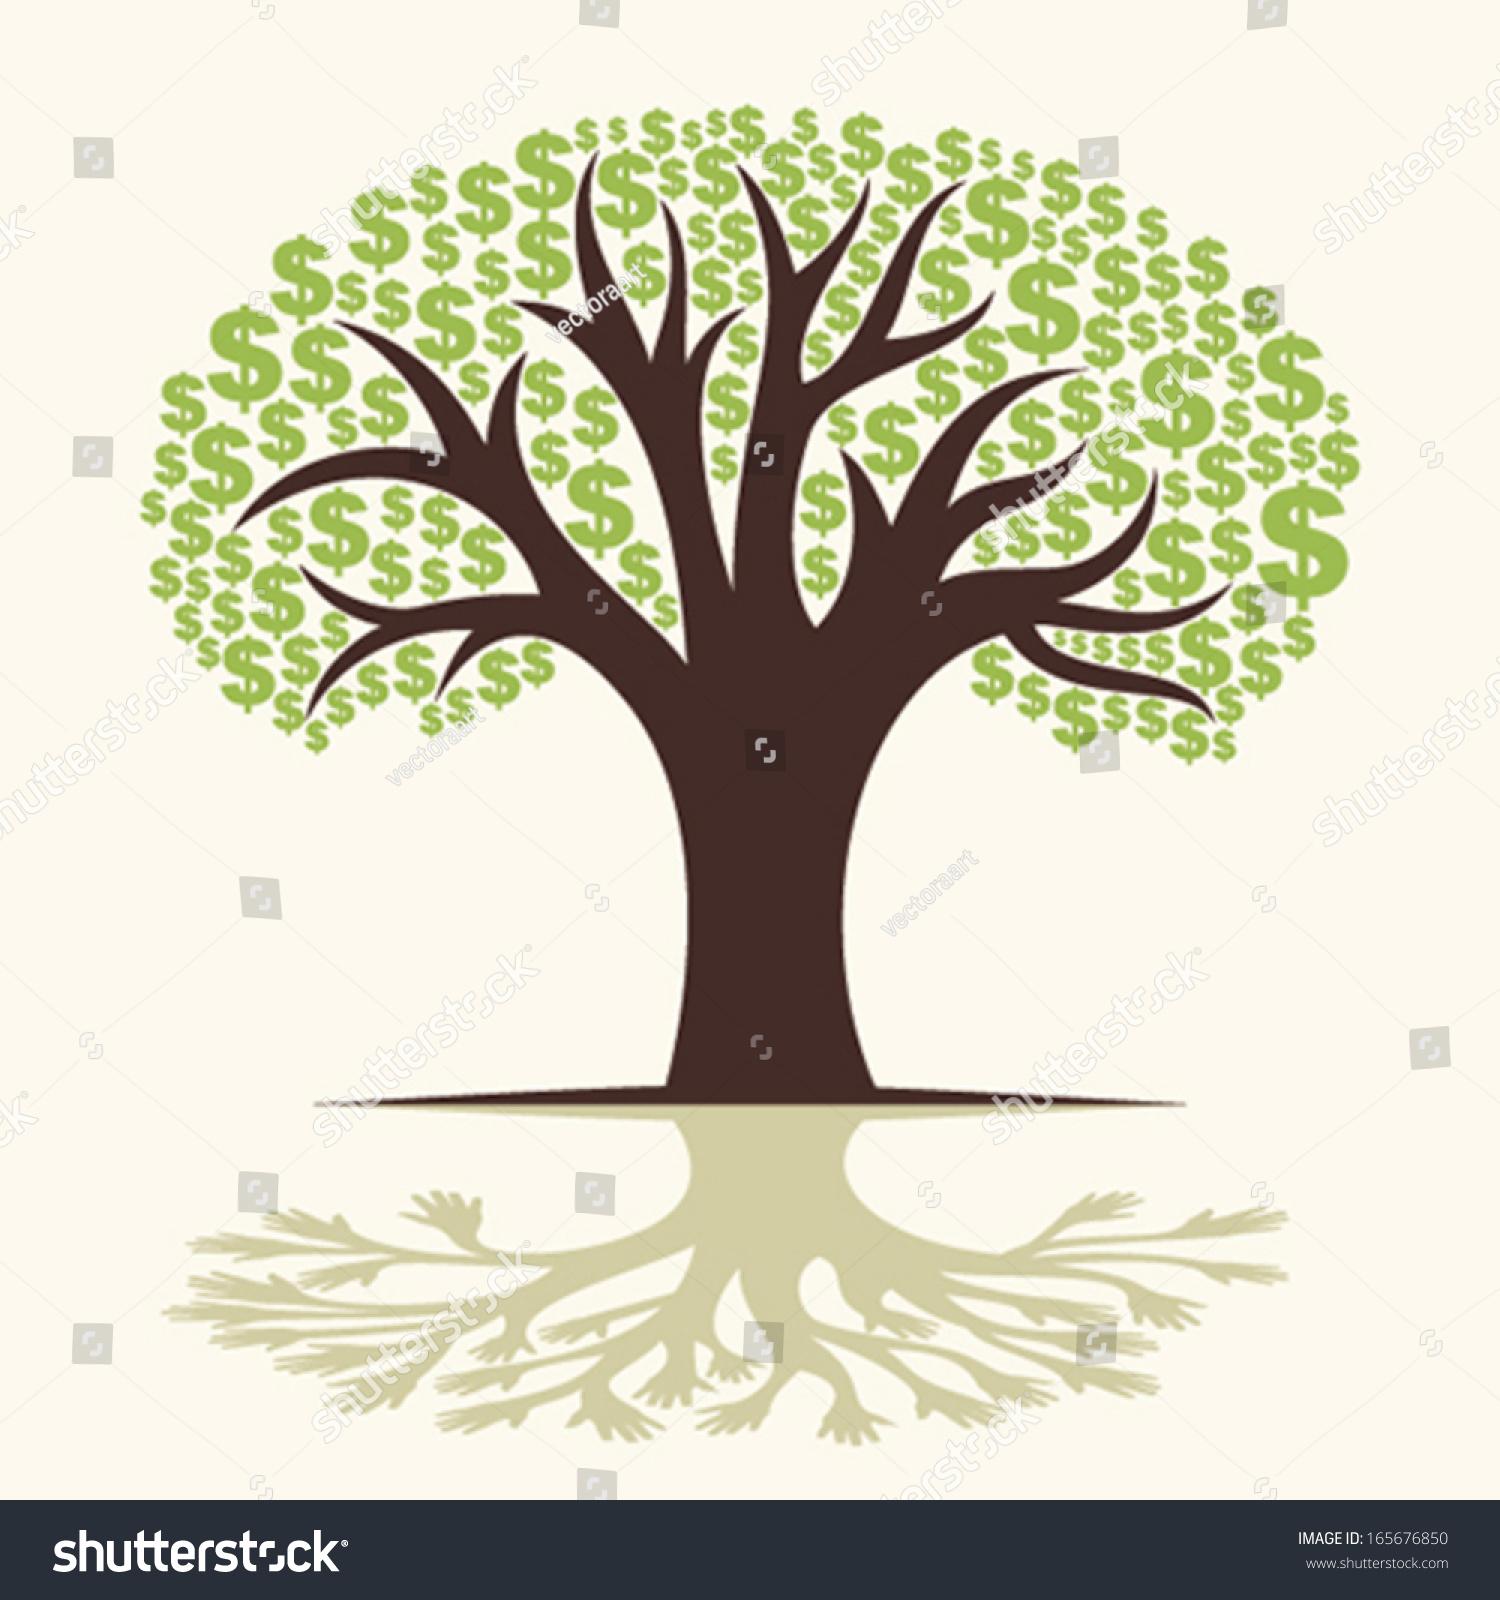 Dollar tree - Dollar Tree Shadow Hand Tree Concept Vector